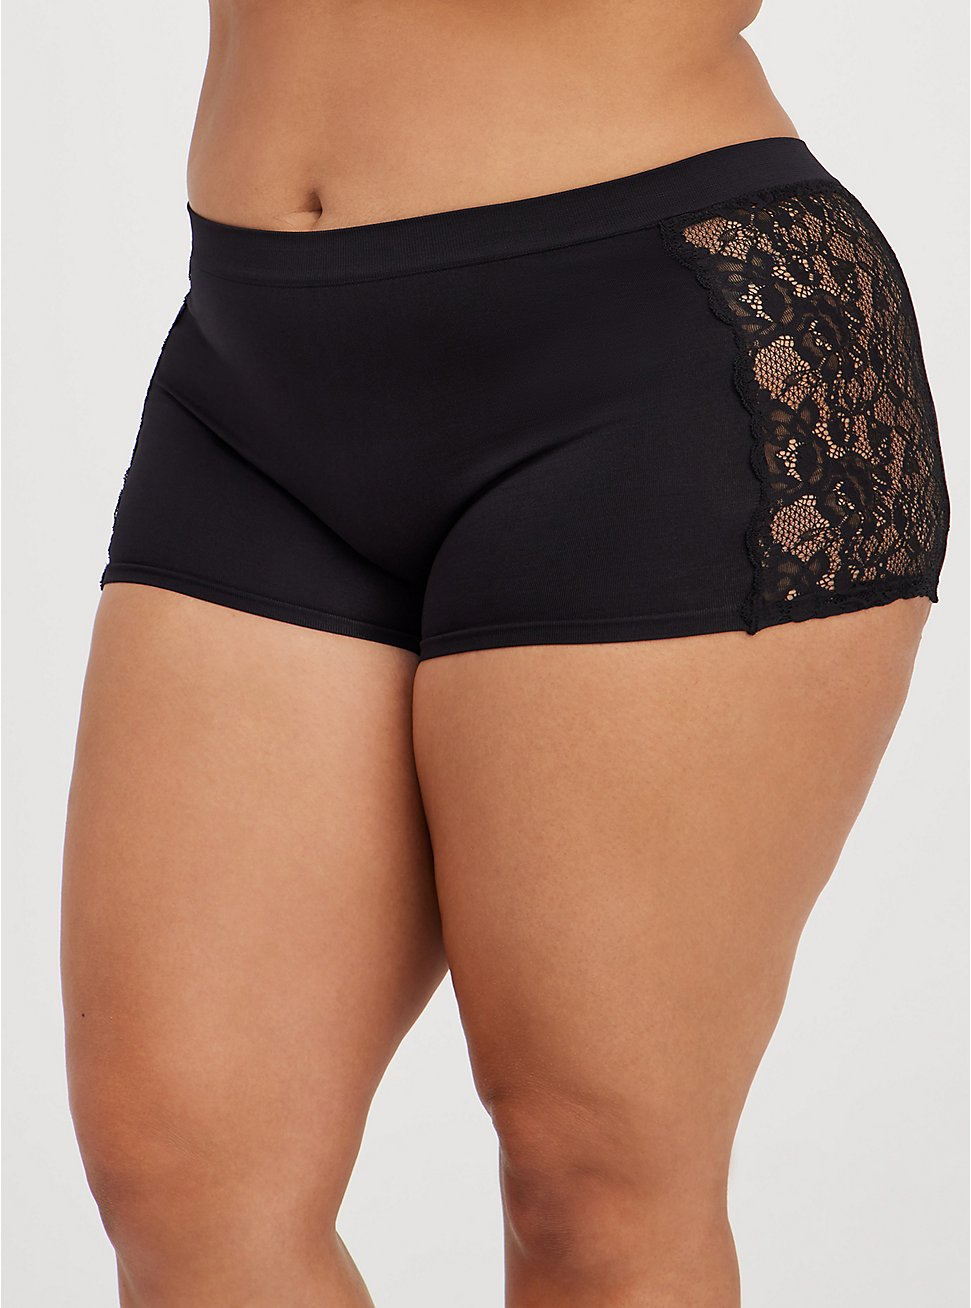 Black Lace Seamless Flirt Boyshort Panty, RICH BLACK, hi-res